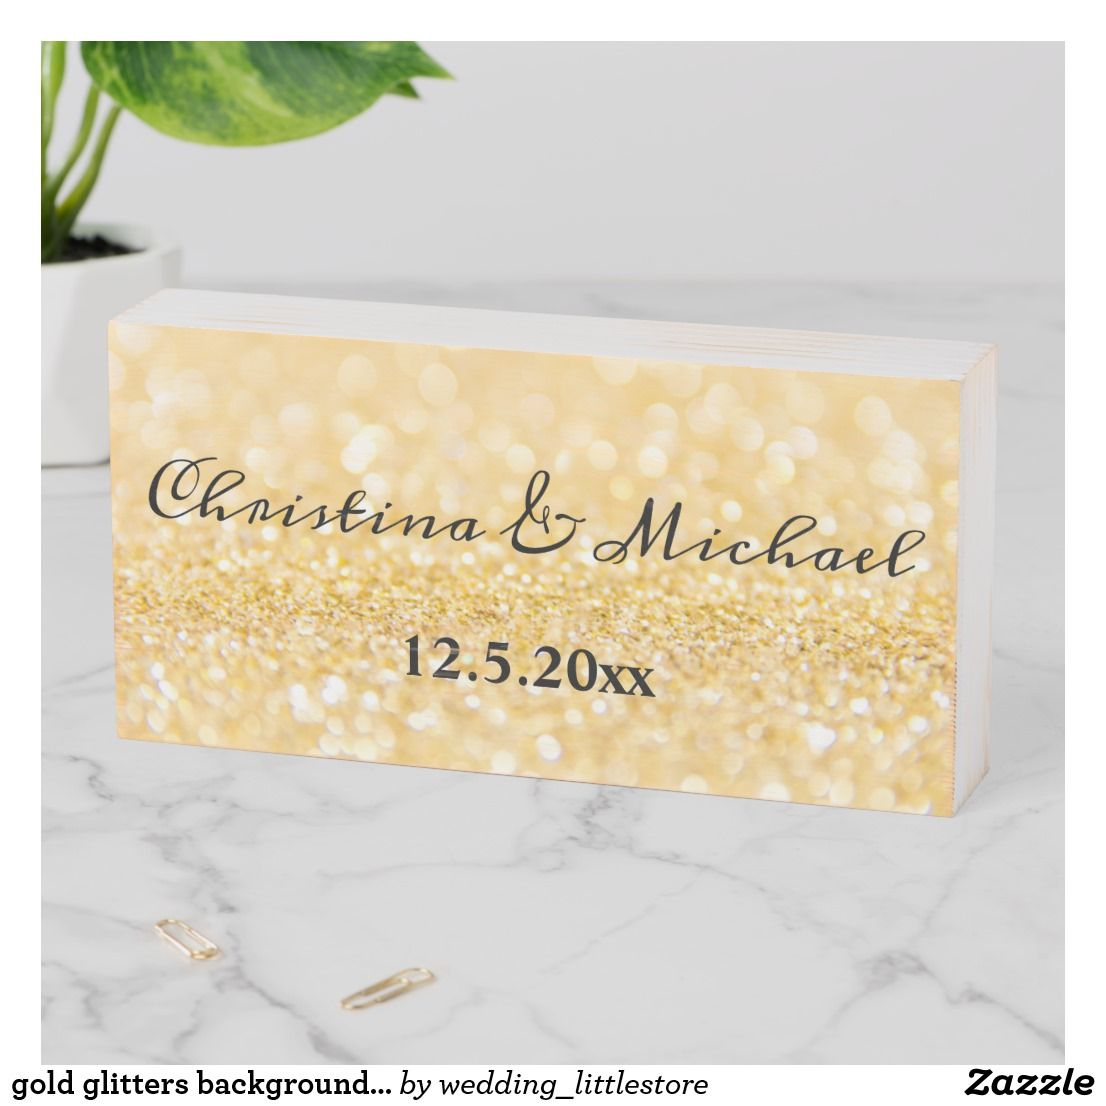 gold glitters background,custom wooden box sign   Zazzle.com #goldglitterbackground